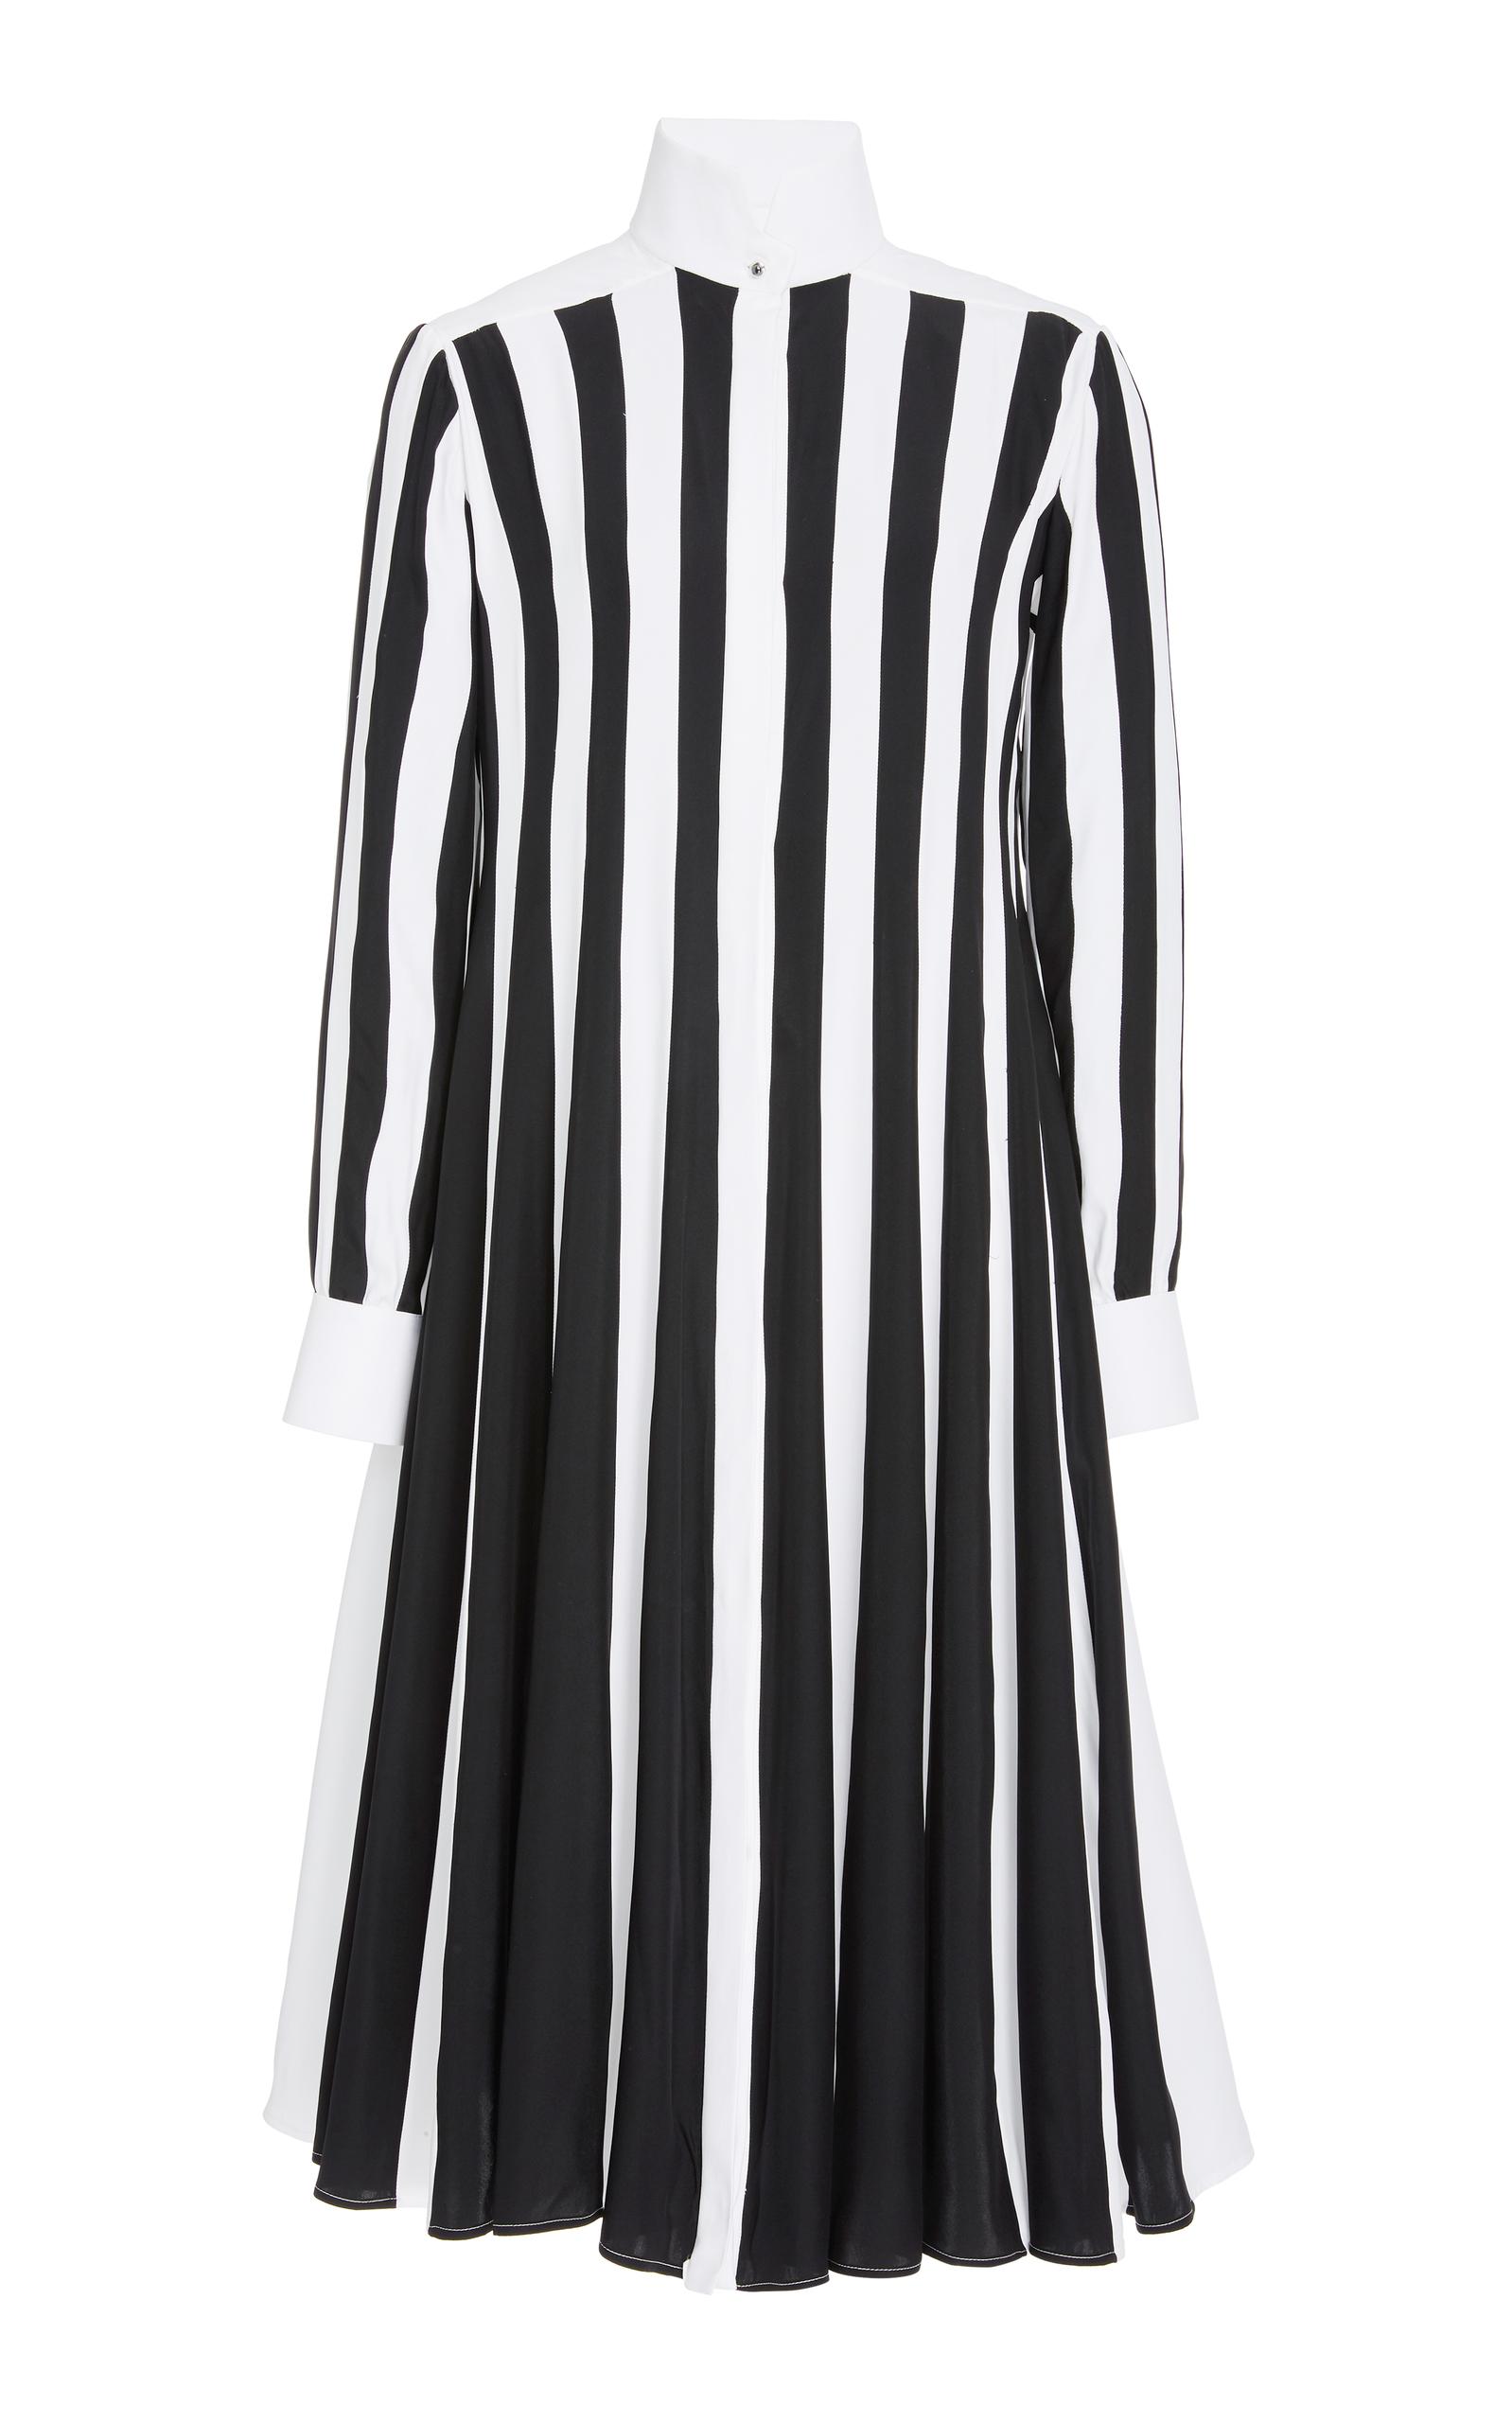 ESME VIE M'O Exclusive Monte Carlo Striped Dress